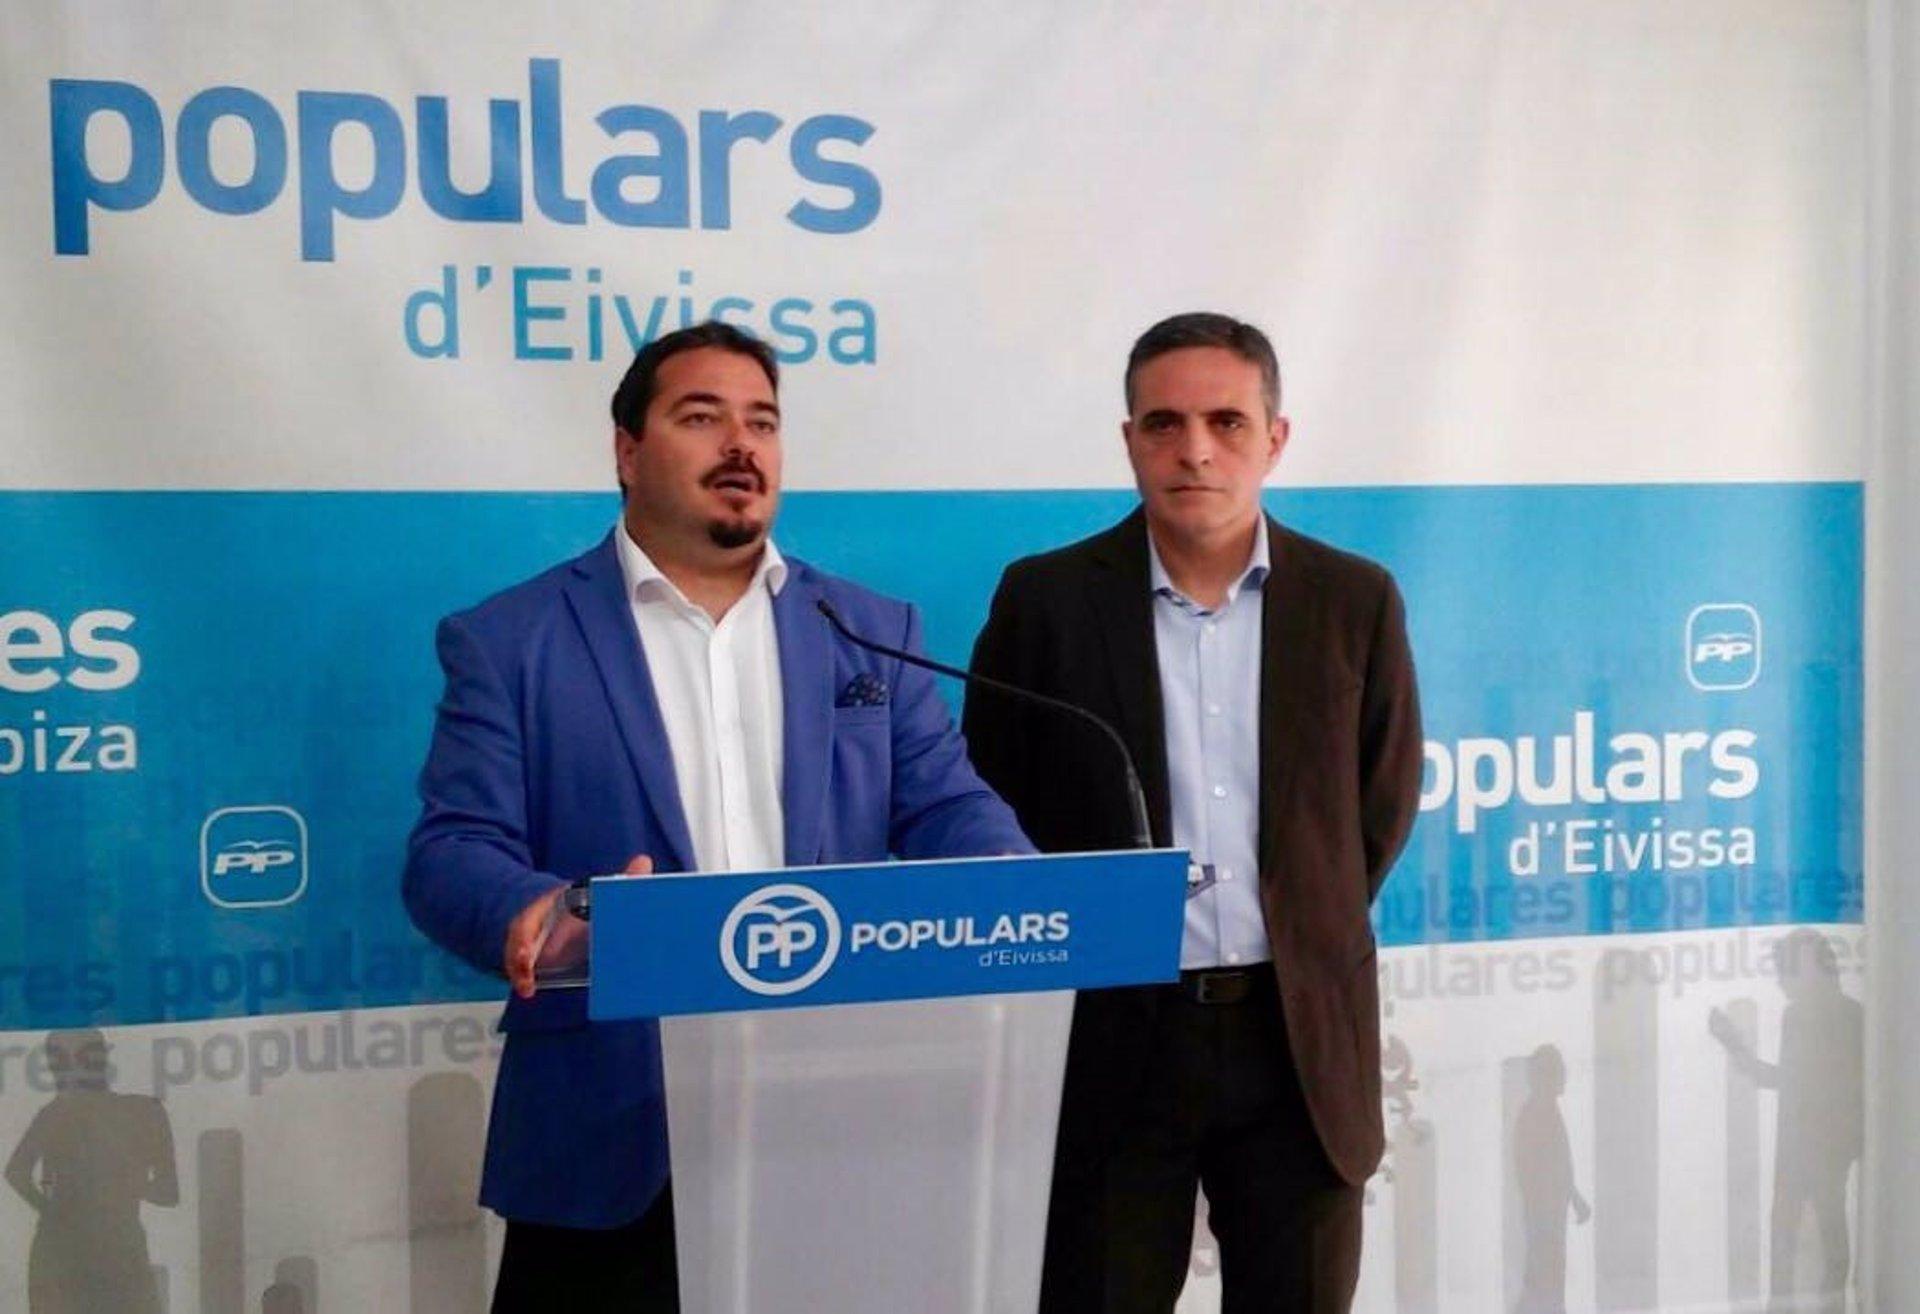 https://img.europapress.es/fotoweb/fotonoticia_20180416150243_1920.jpg